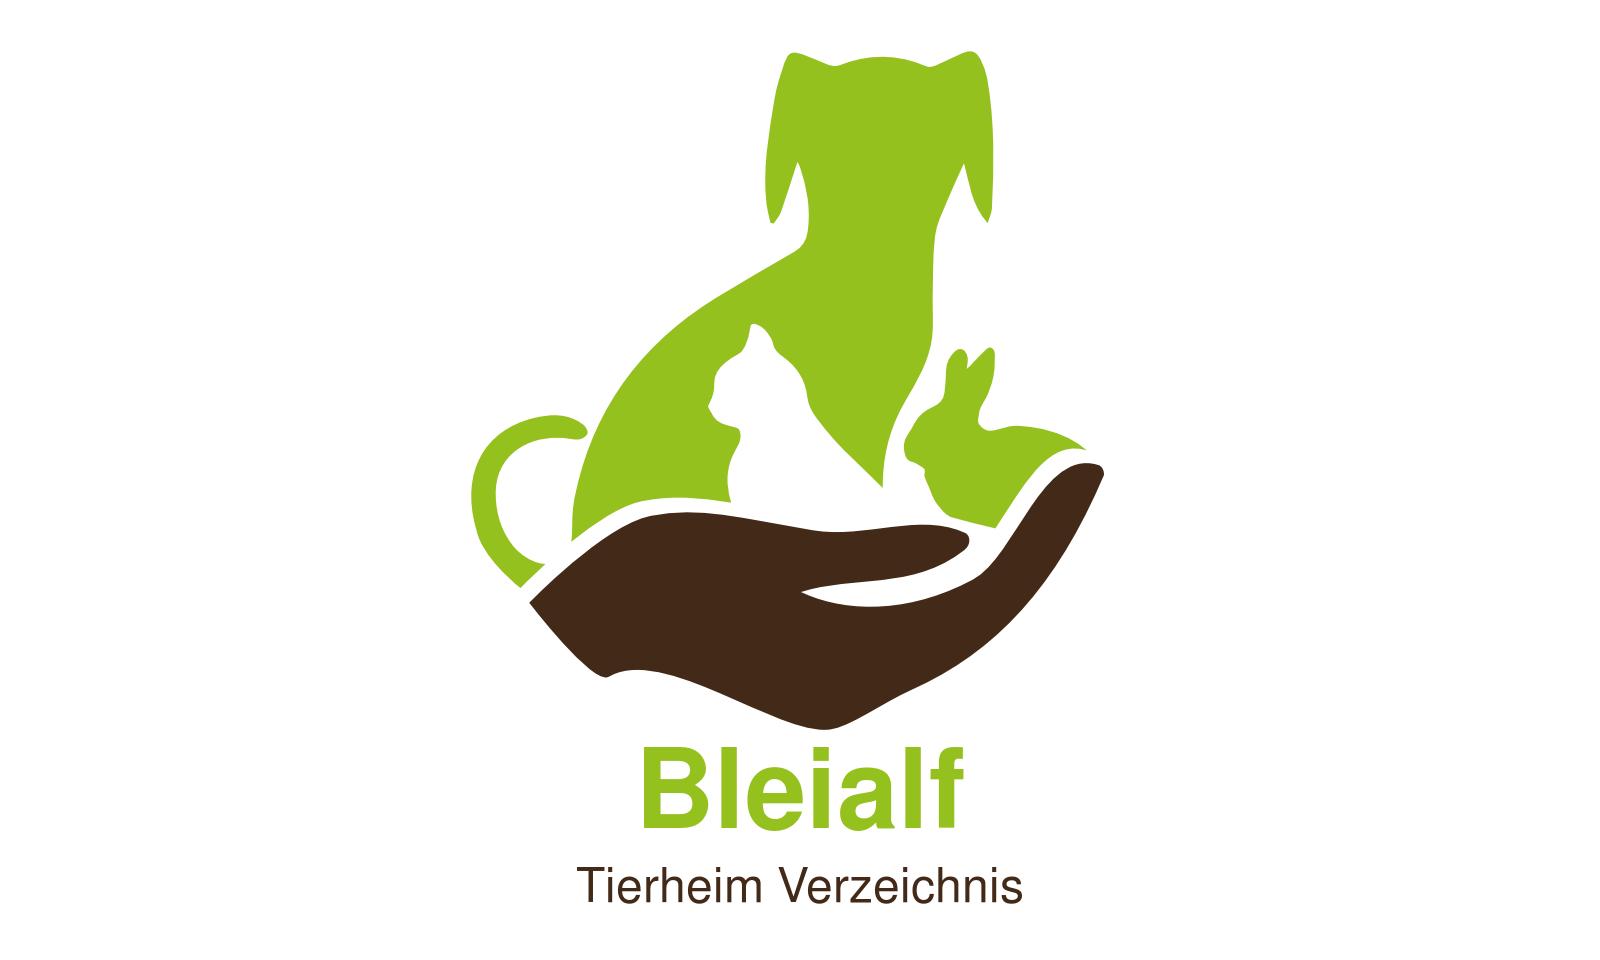 Tierheim Bleialf